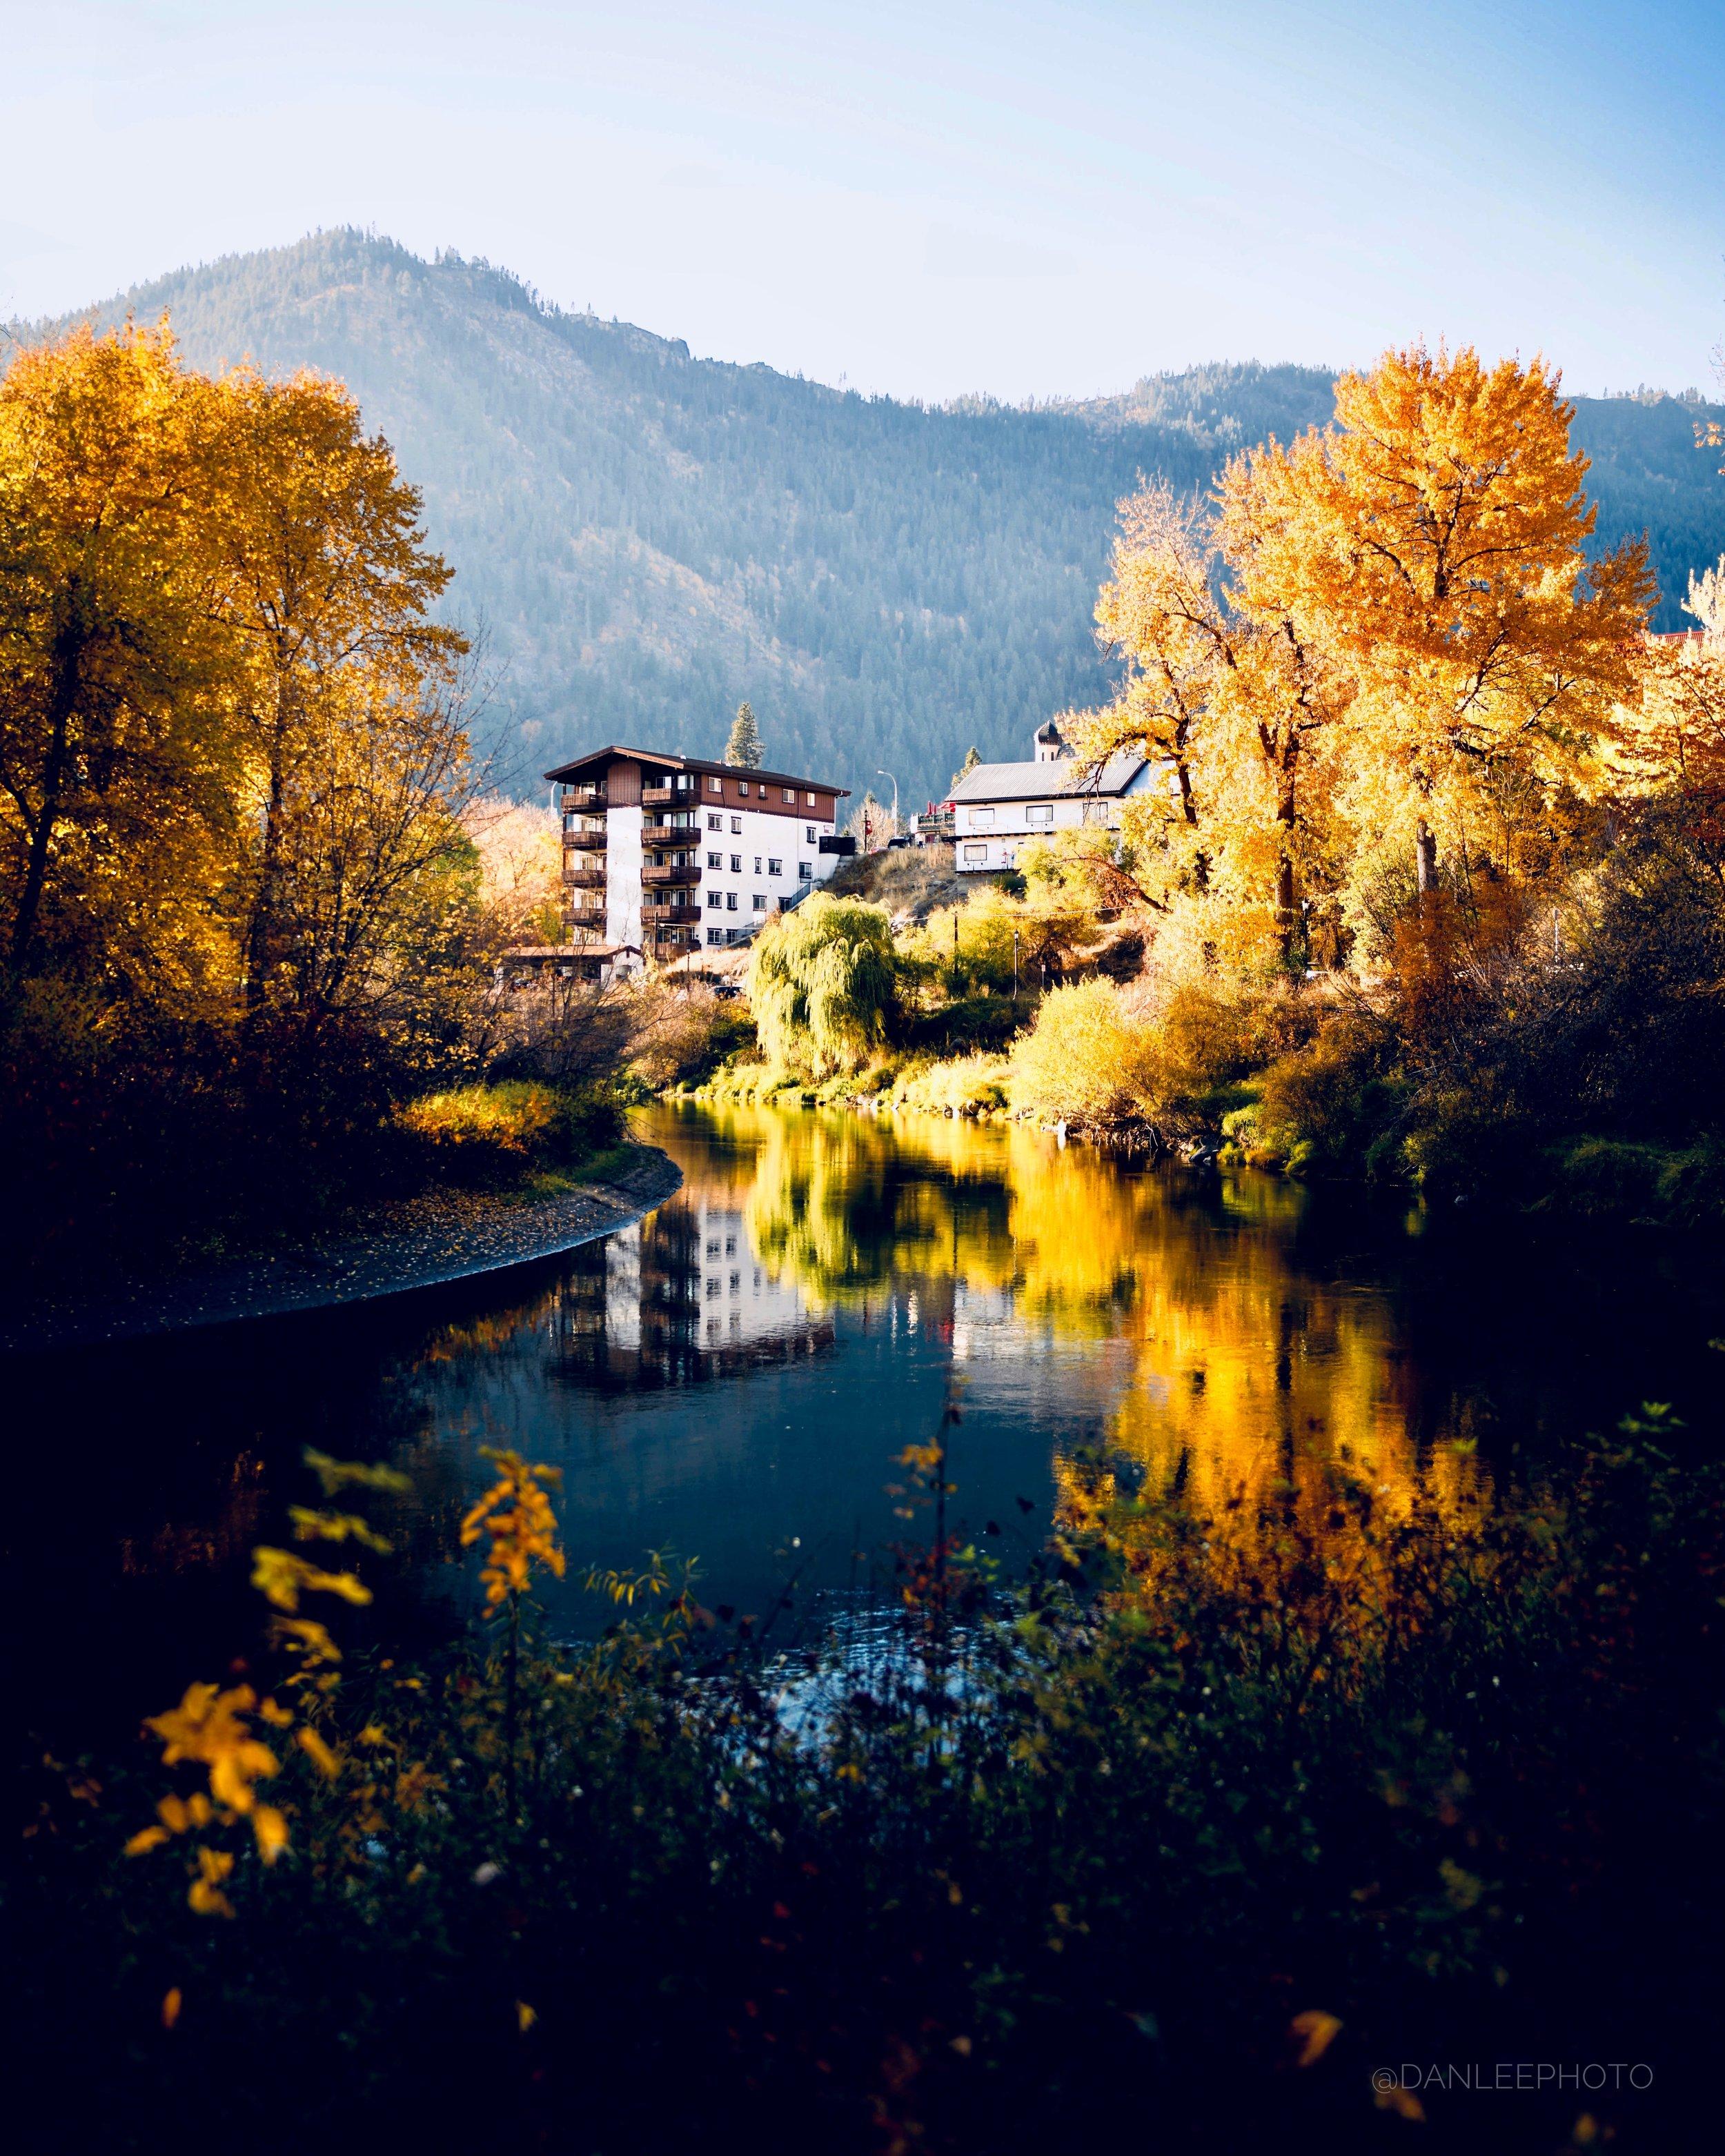 An autumn afternoon in Leavenworth, WA. Photo by Daniel Lee.